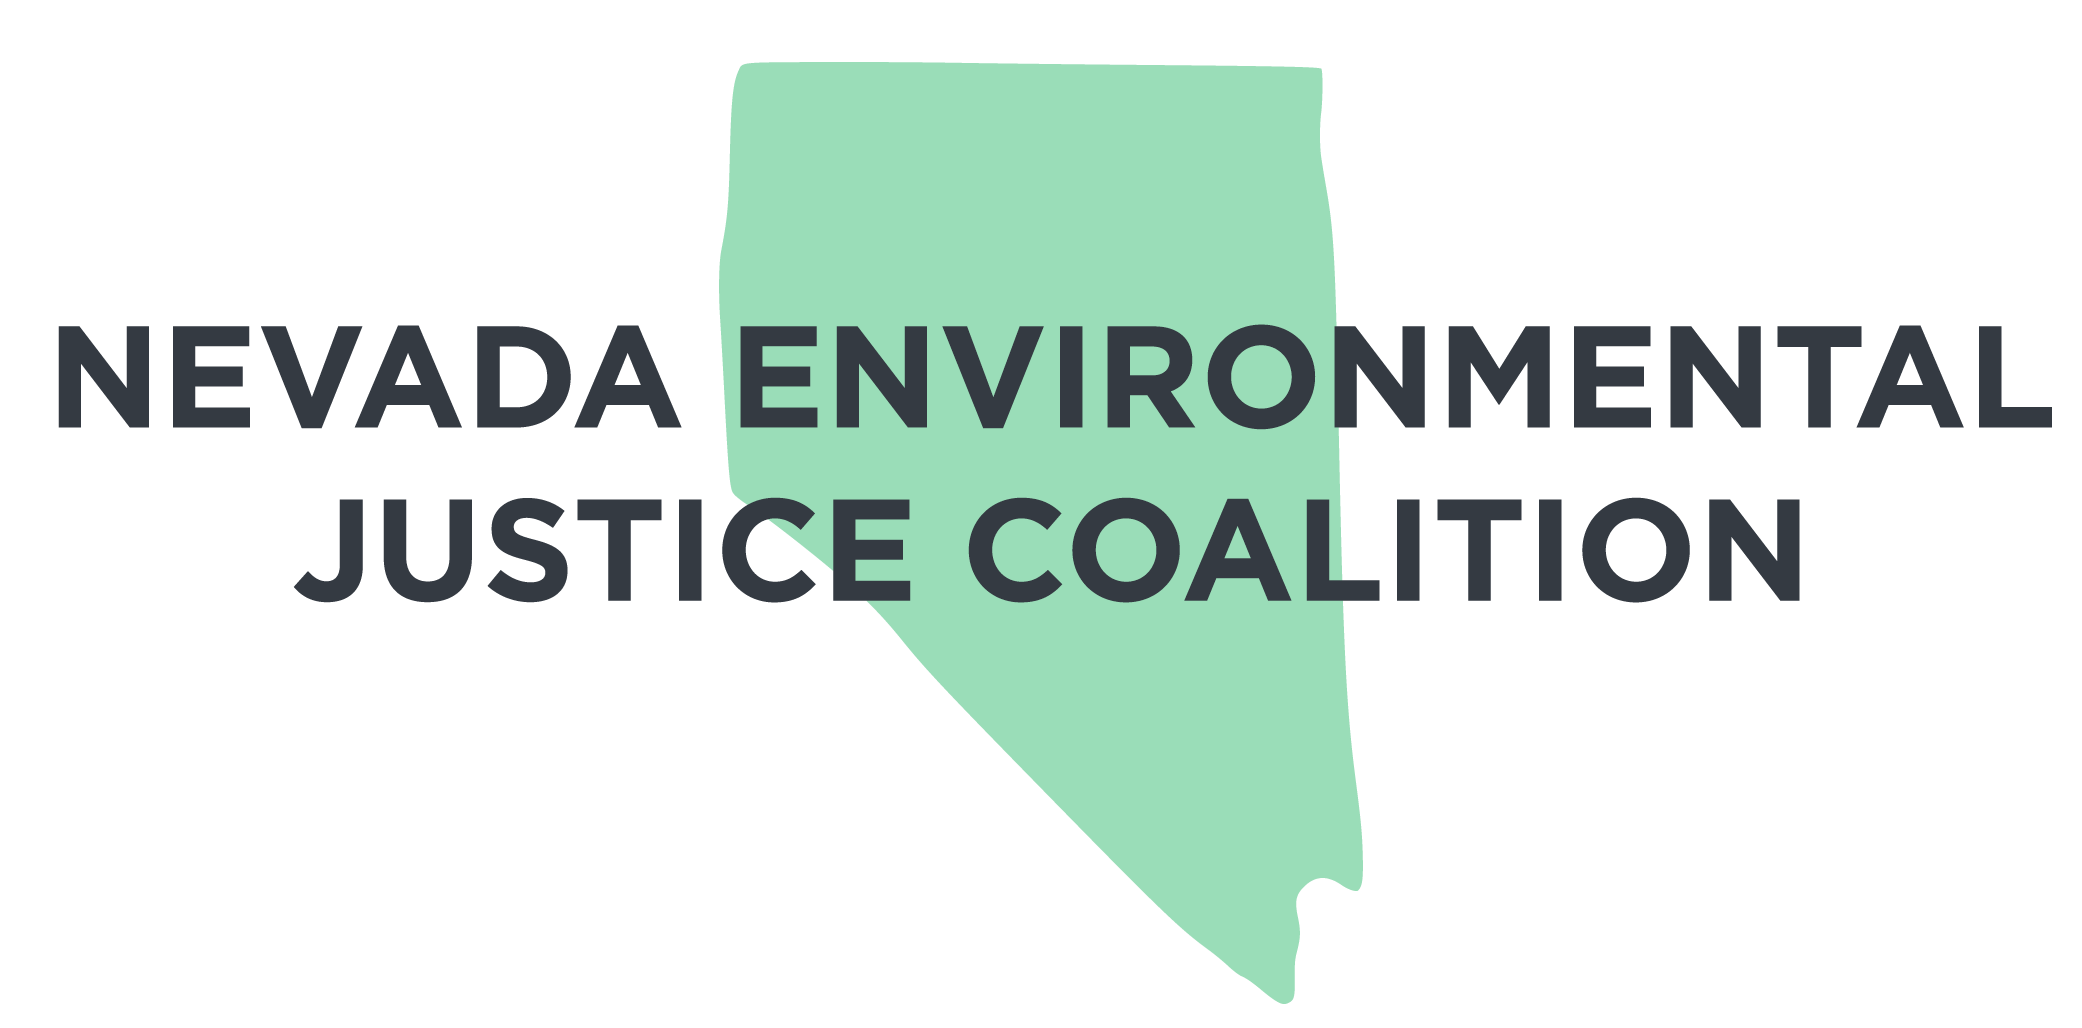 Nevada Environmental Justice Coalition -